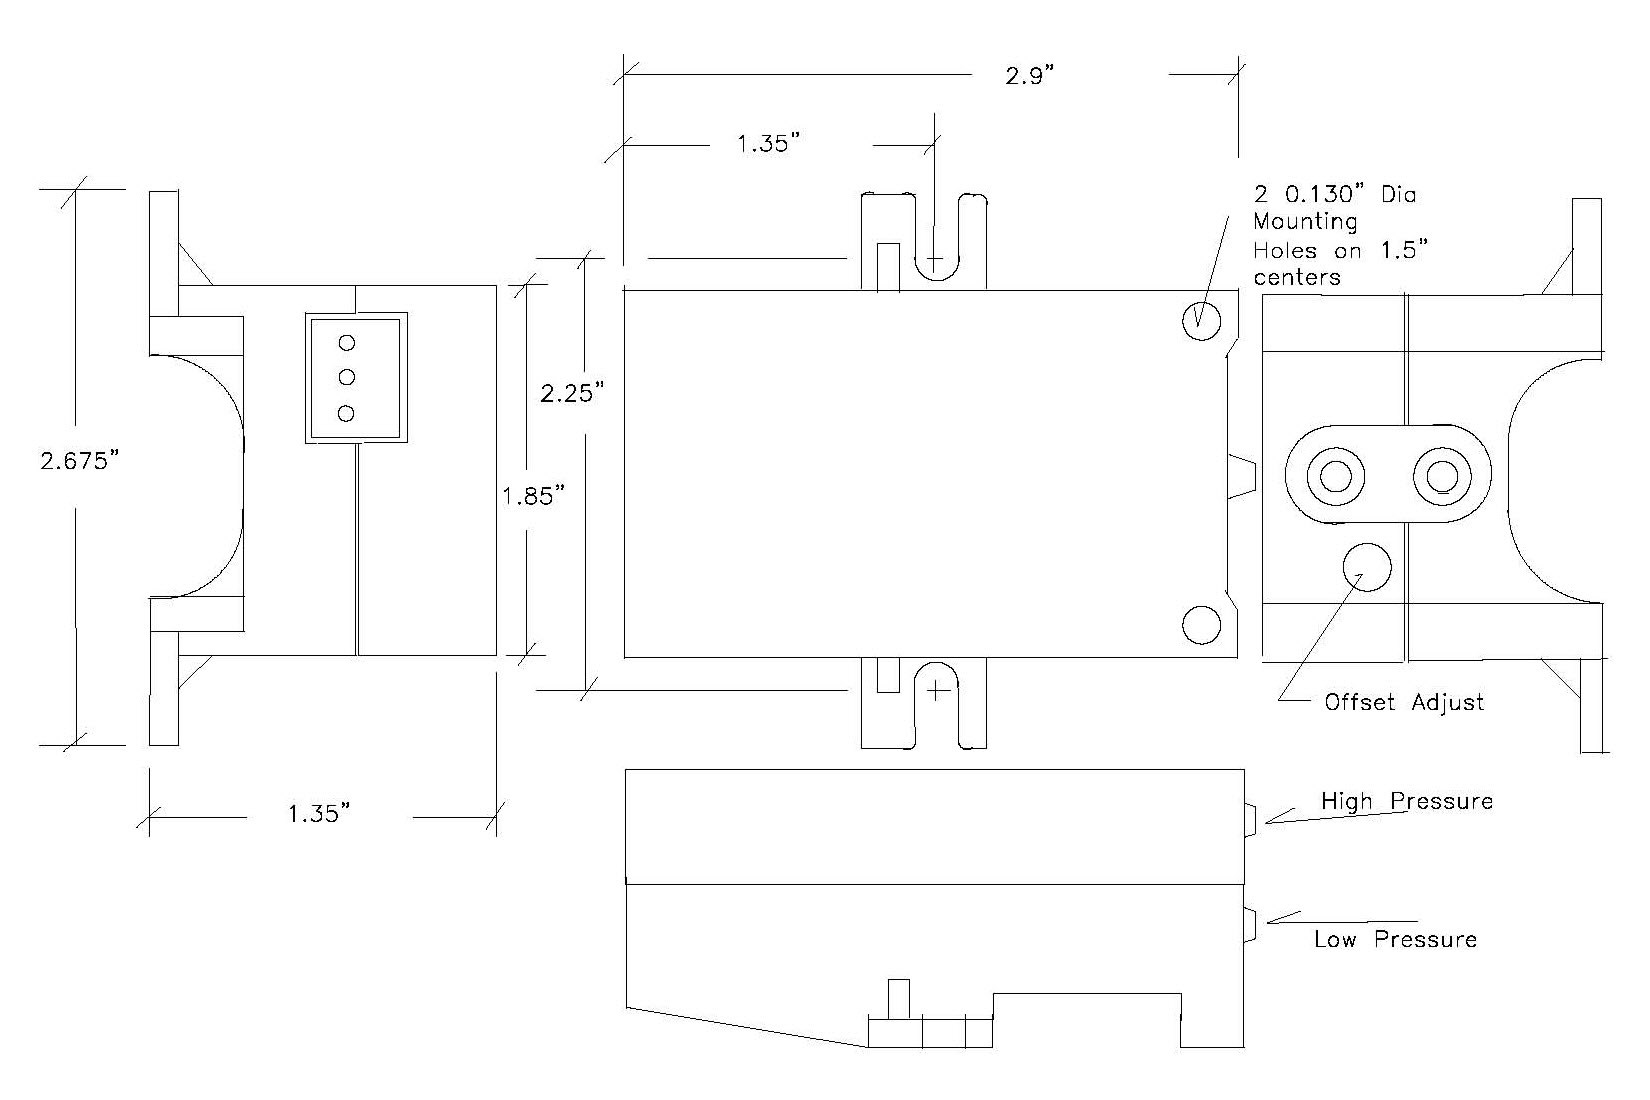 Series 860 Pressure Transducer - Controller Sensors